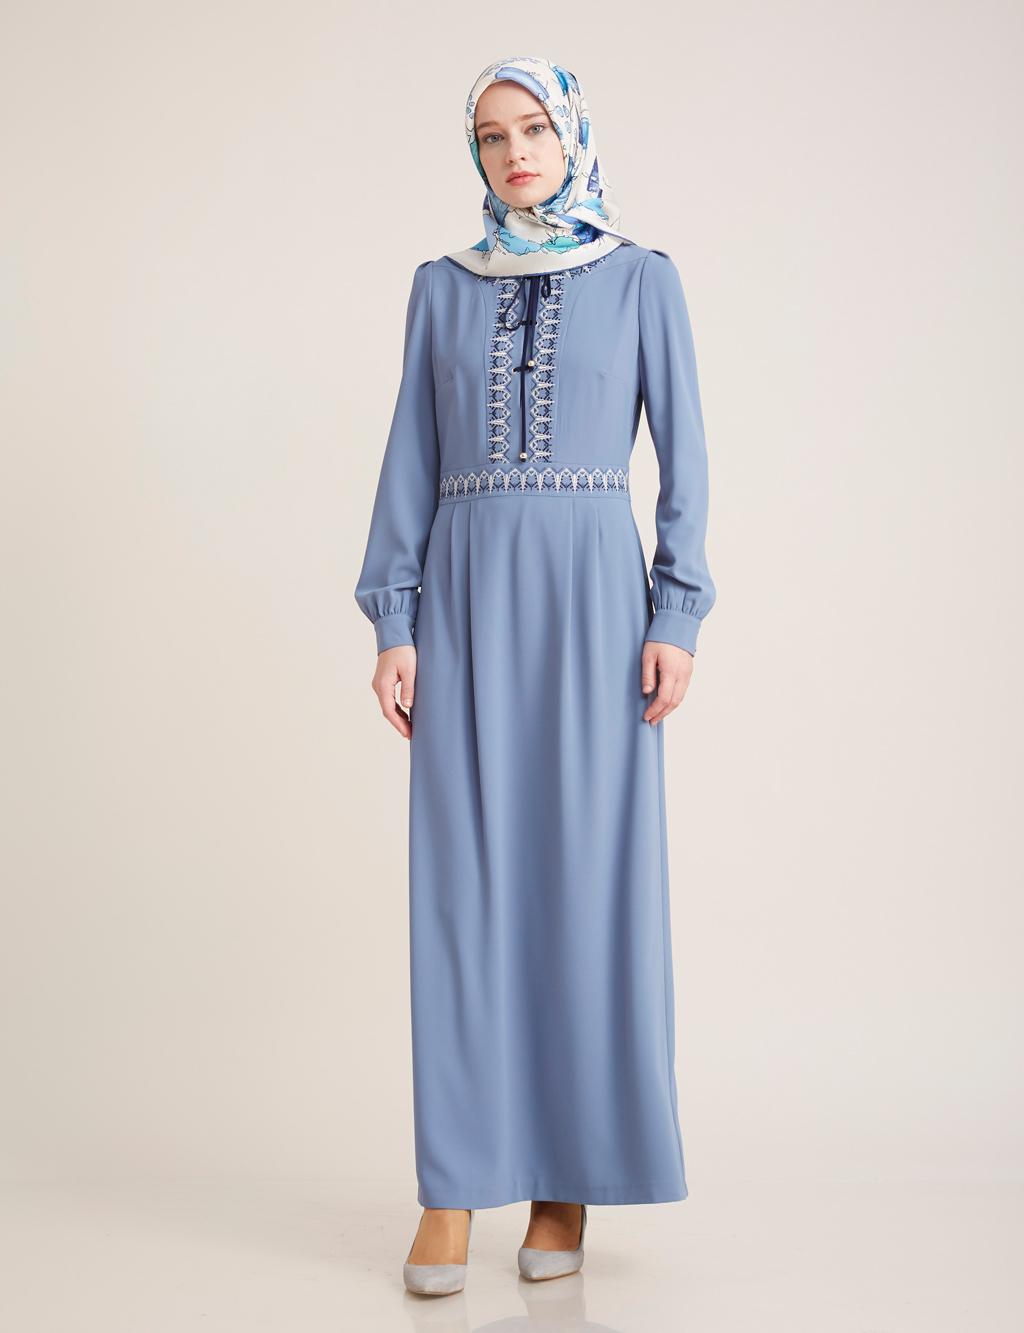 Kayra Giyim Önü Bağcık Detaylı Elbise Petrol